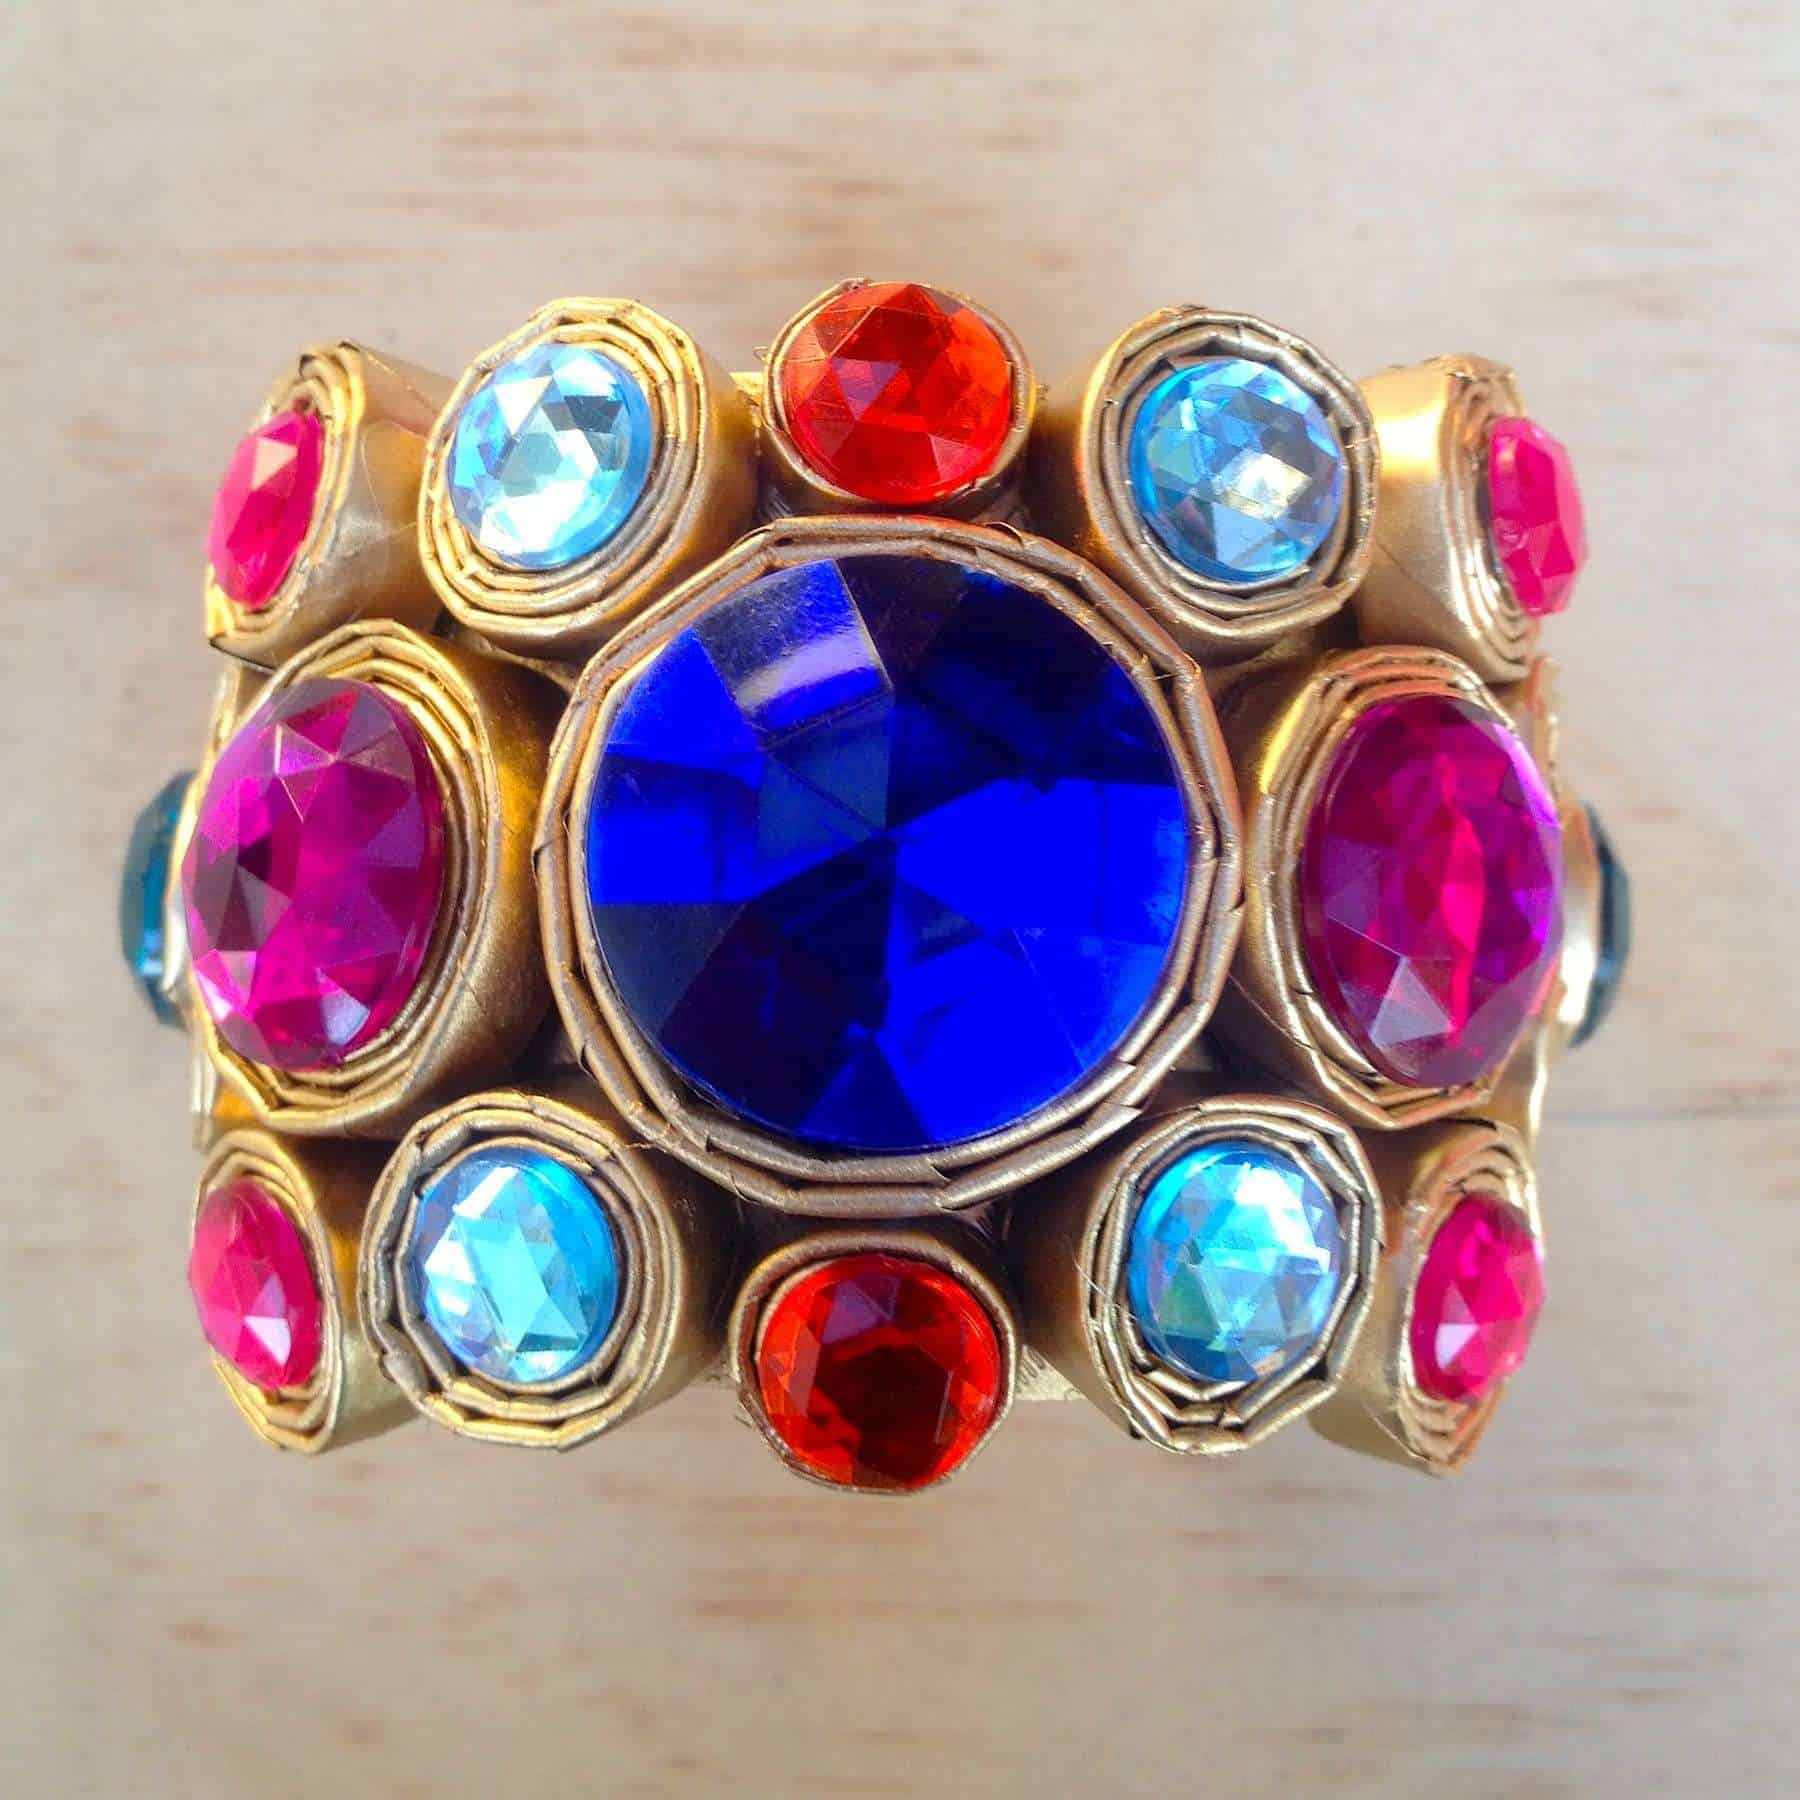 80\'s Inspired Paper Jewelry • Recyclart